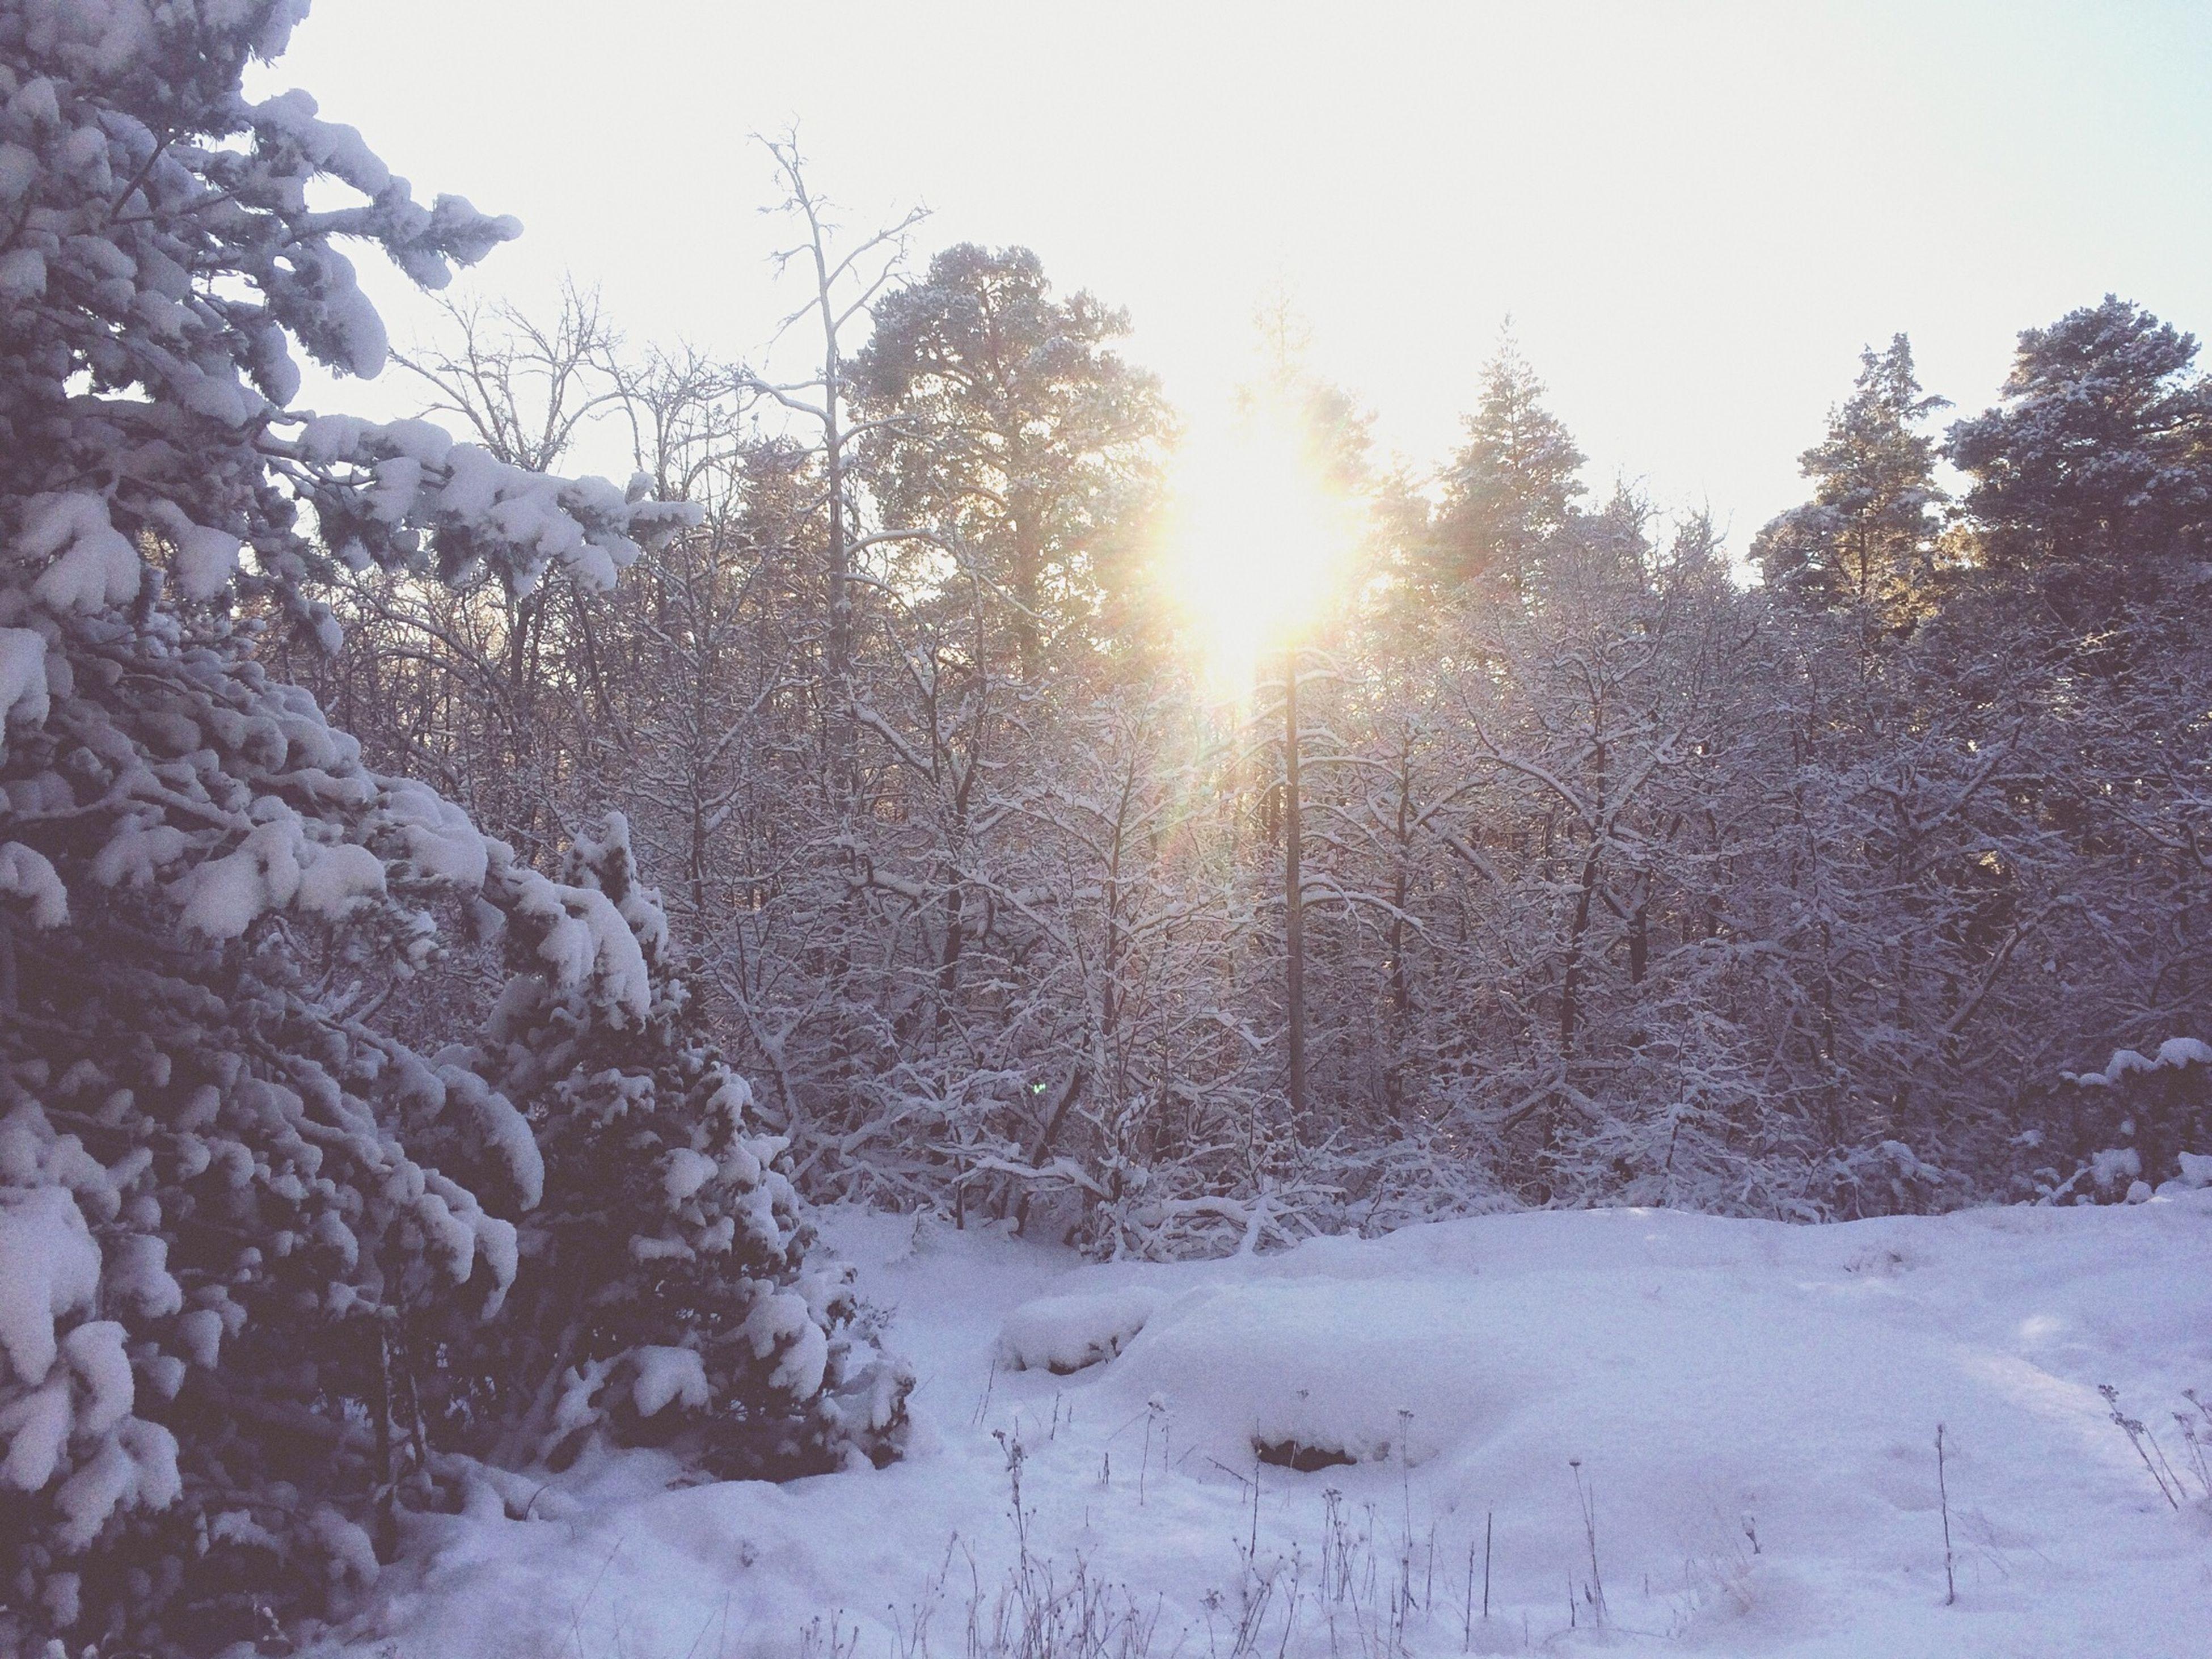 snow, winter, cold temperature, season, tree, tranquility, tranquil scene, beauty in nature, weather, scenics, nature, clear sky, sun, covering, frozen, sunlight, landscape, sunbeam, non-urban scene, lens flare